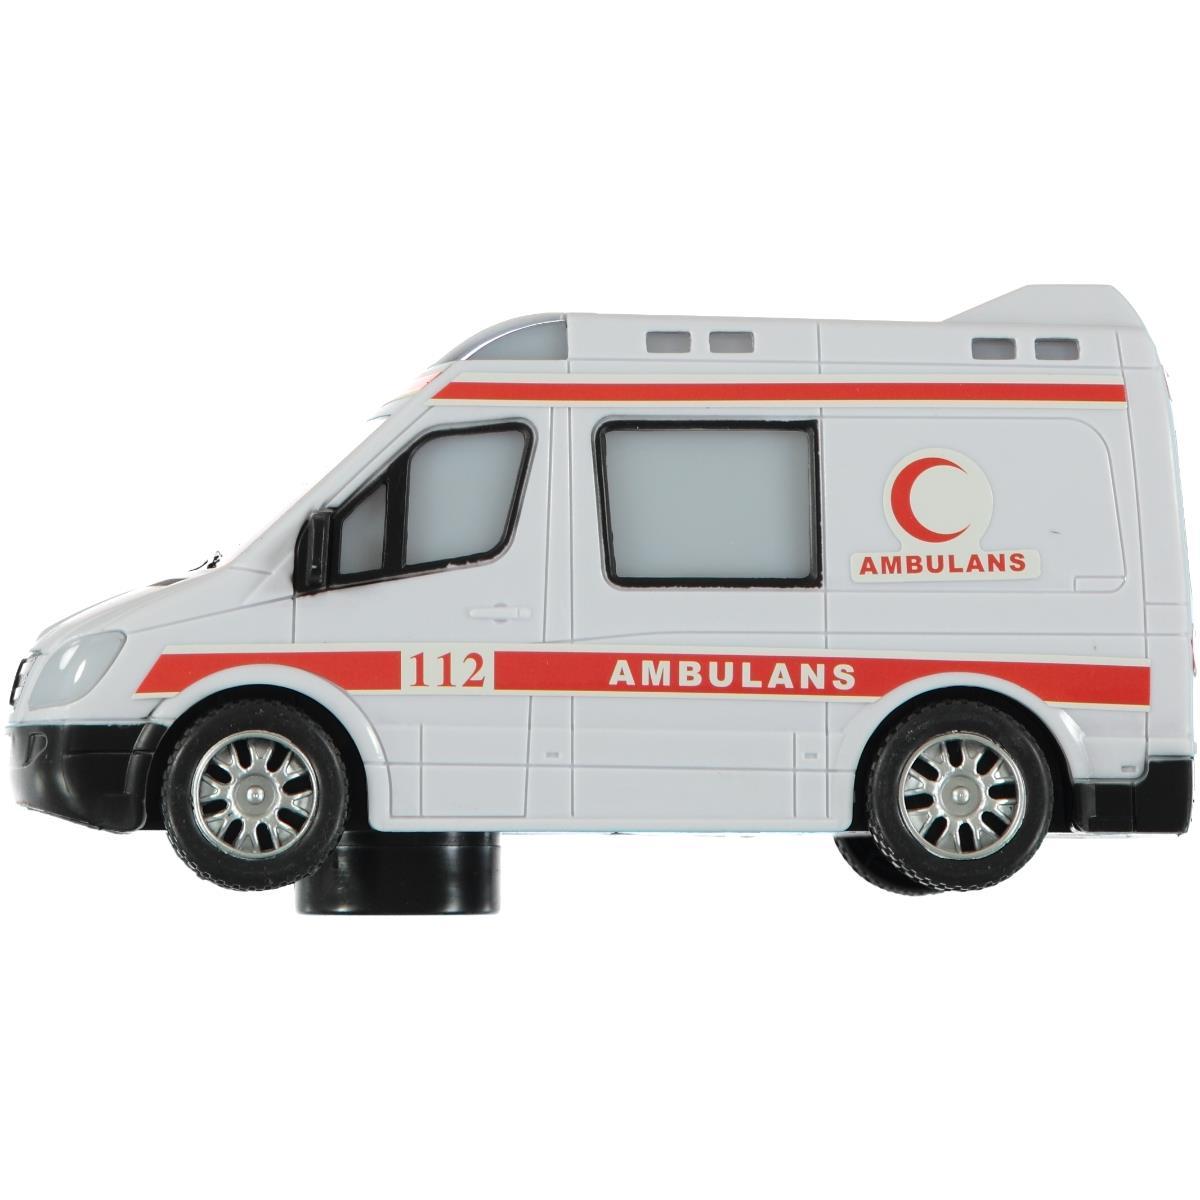 Vardem N366u Tc 135a B Vardem Isikli Sesli Polis Ve Ambulans 3 Yas